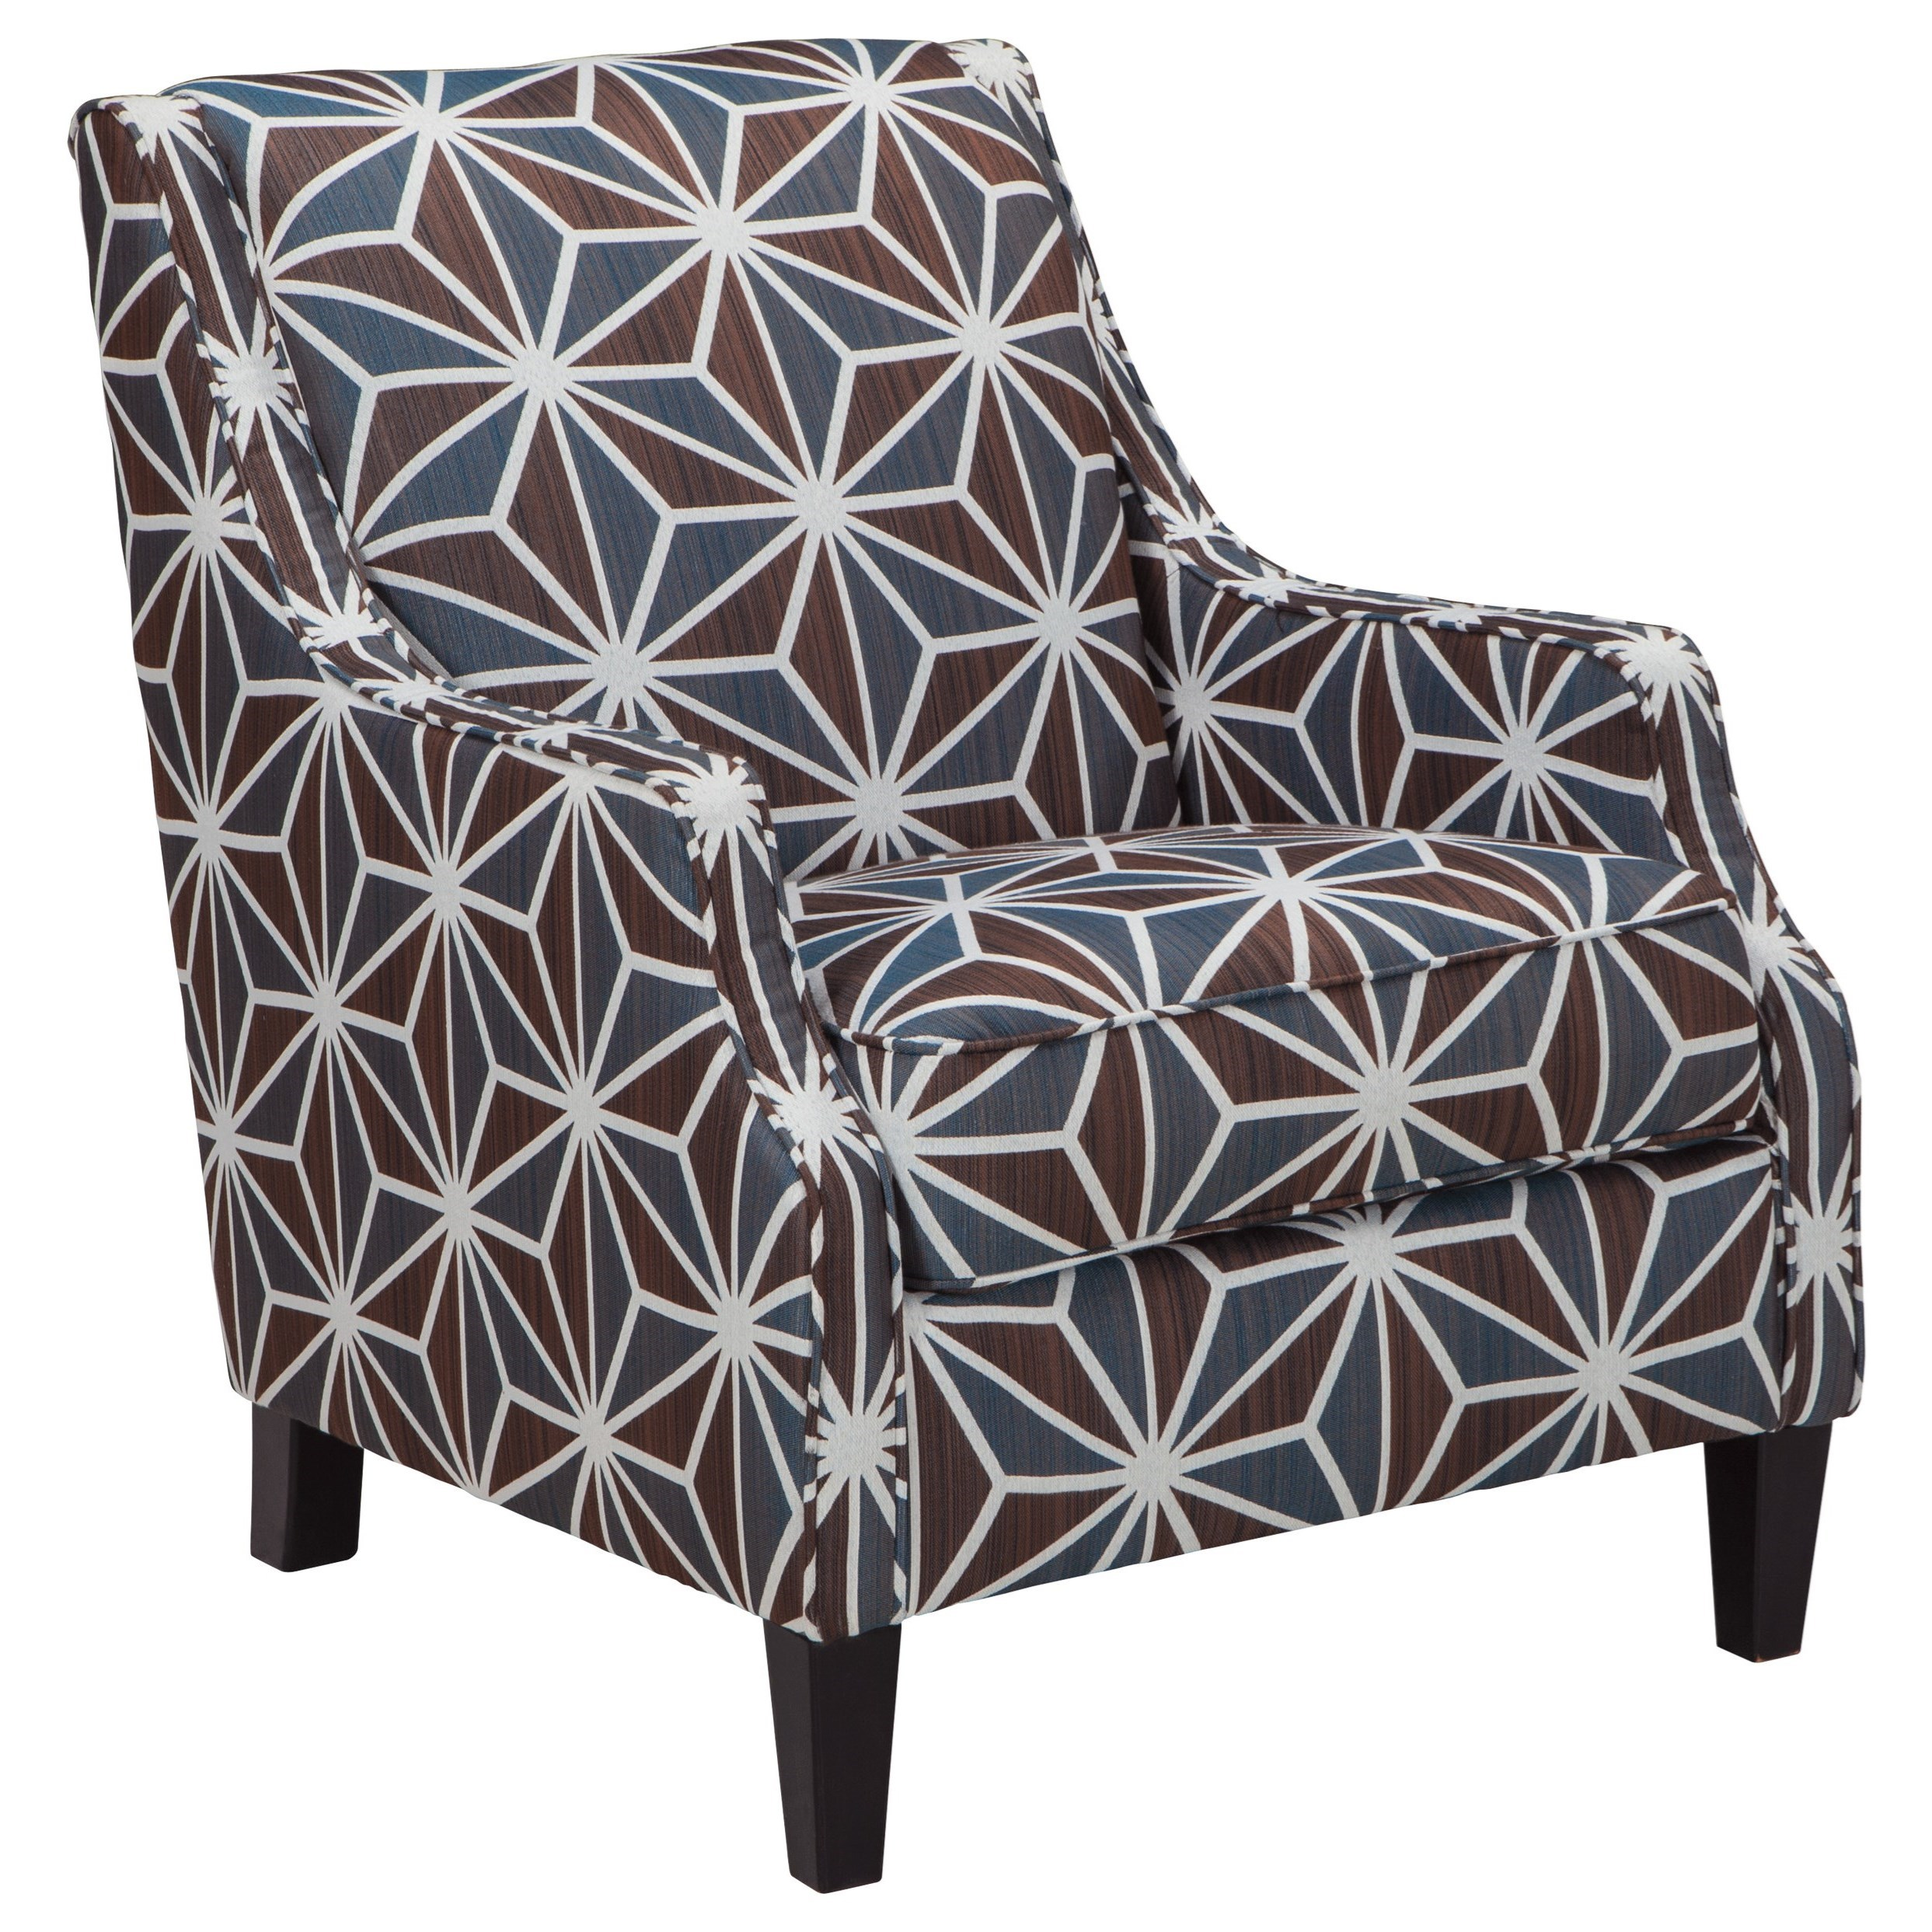 Brisbane Accent Chair by Benchcraft at Walker's Furniture